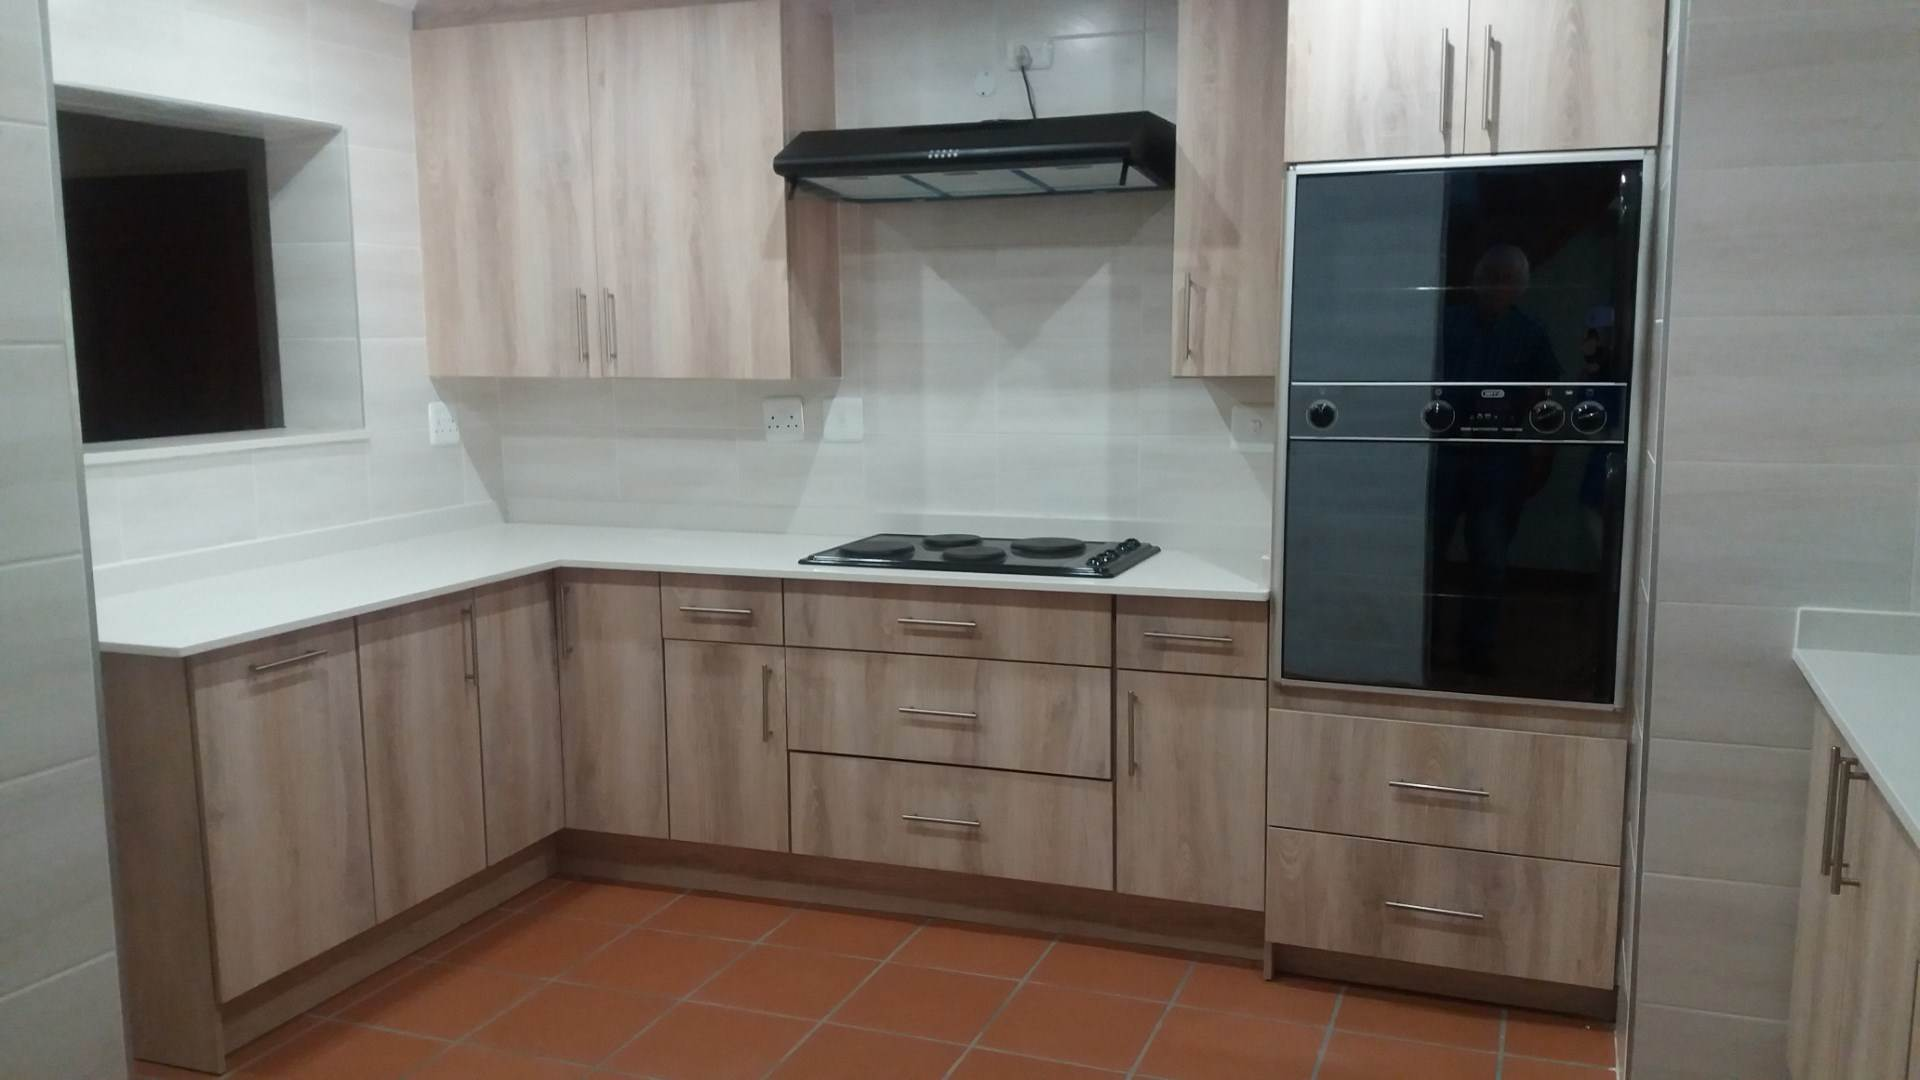 Moreleta Park property for sale. Ref No: 13551813. Picture no 2